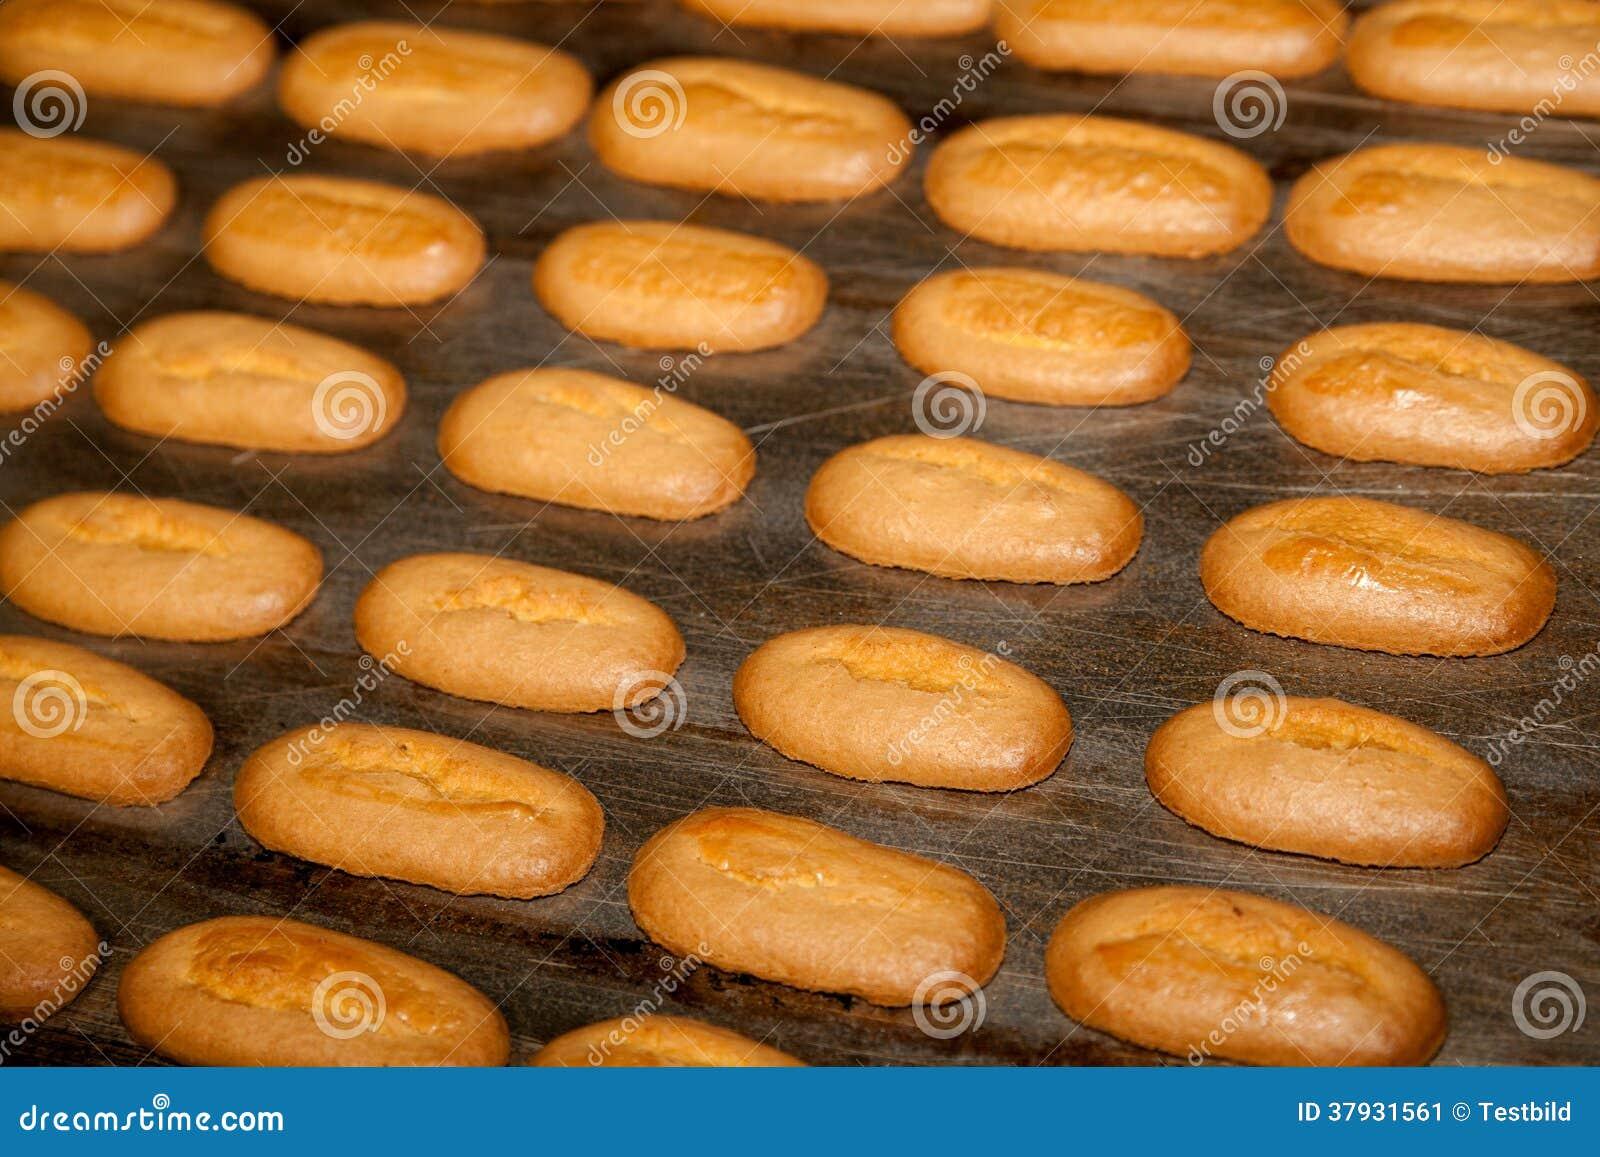 Biscotti от Италии